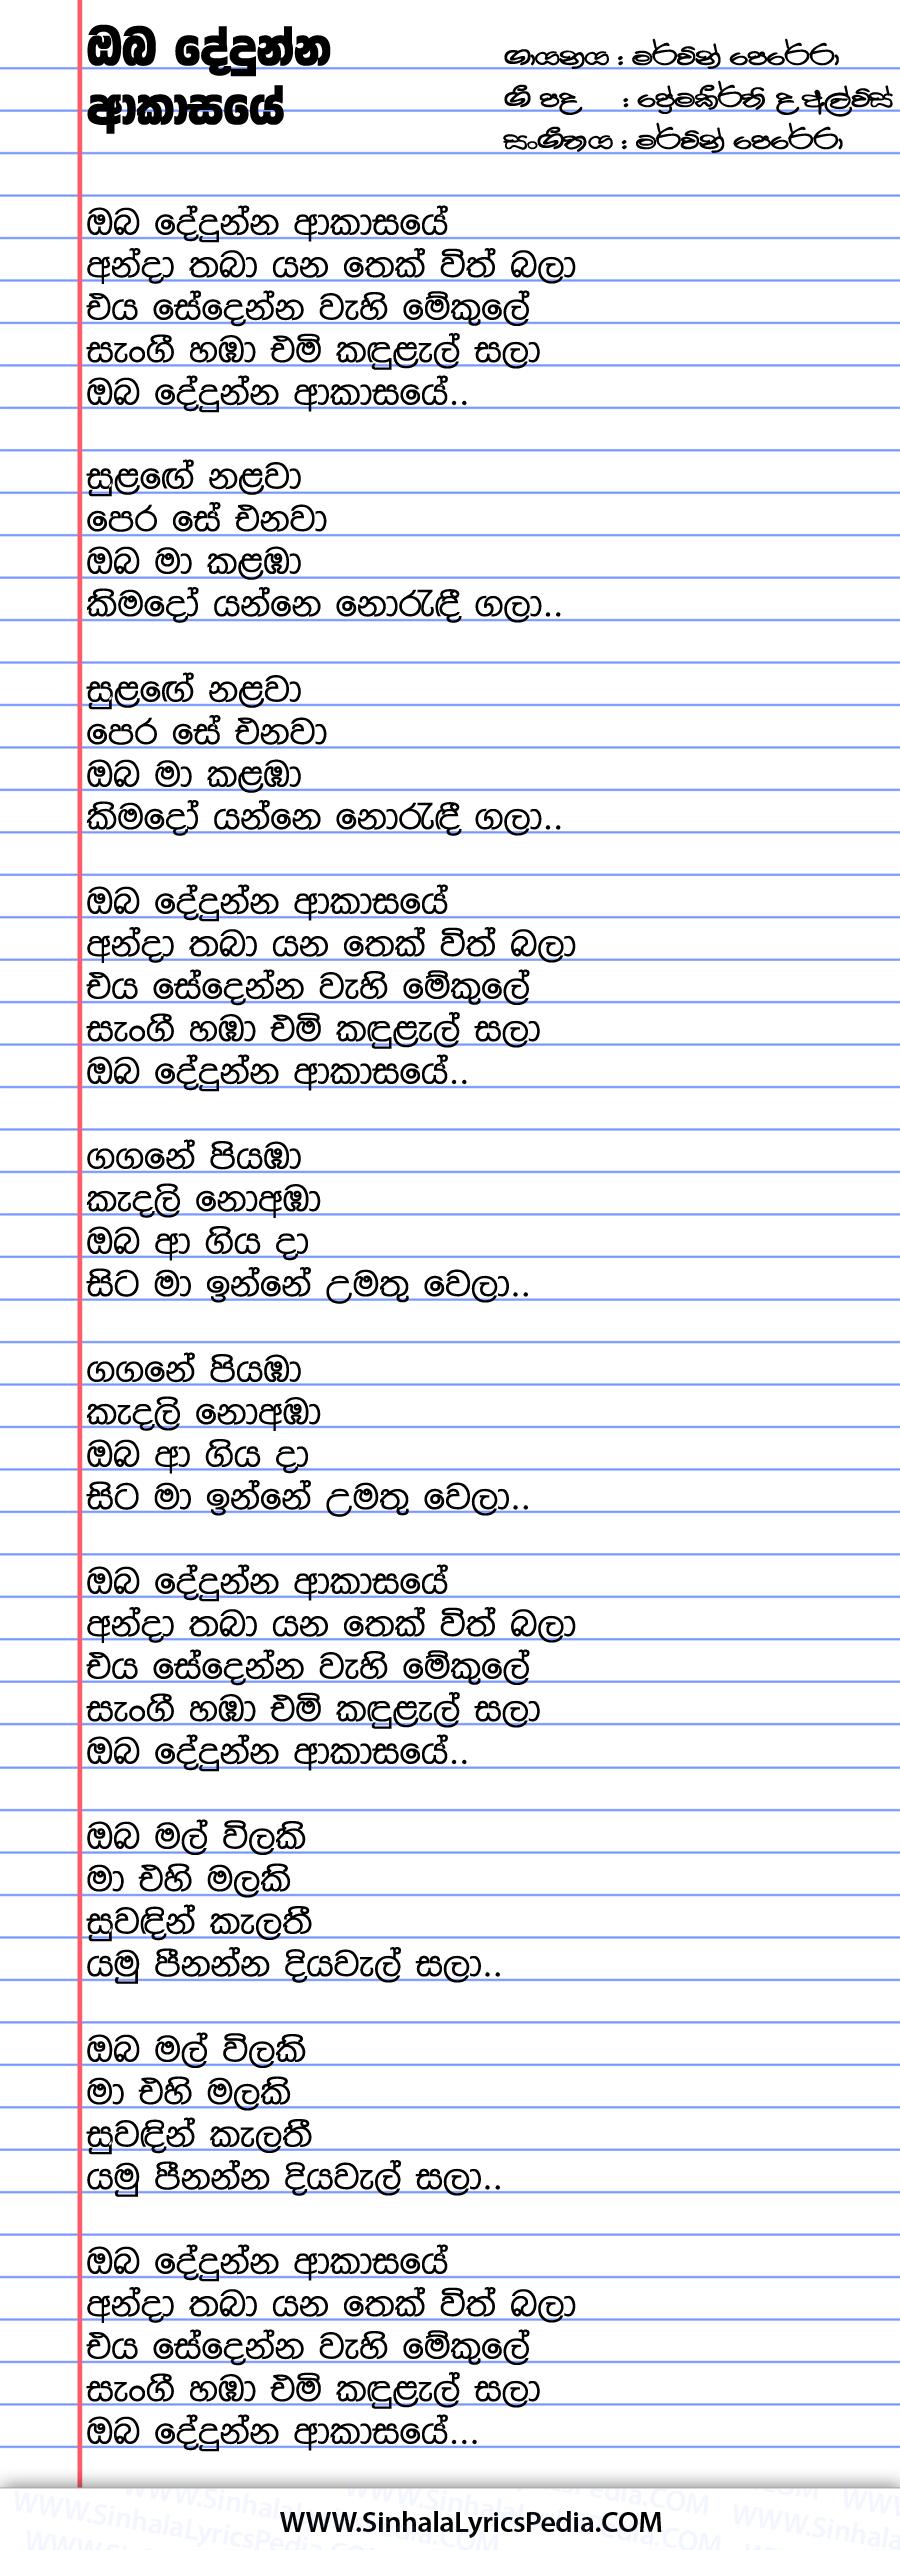 Oba Dedunna Akasaye Song Lyrics